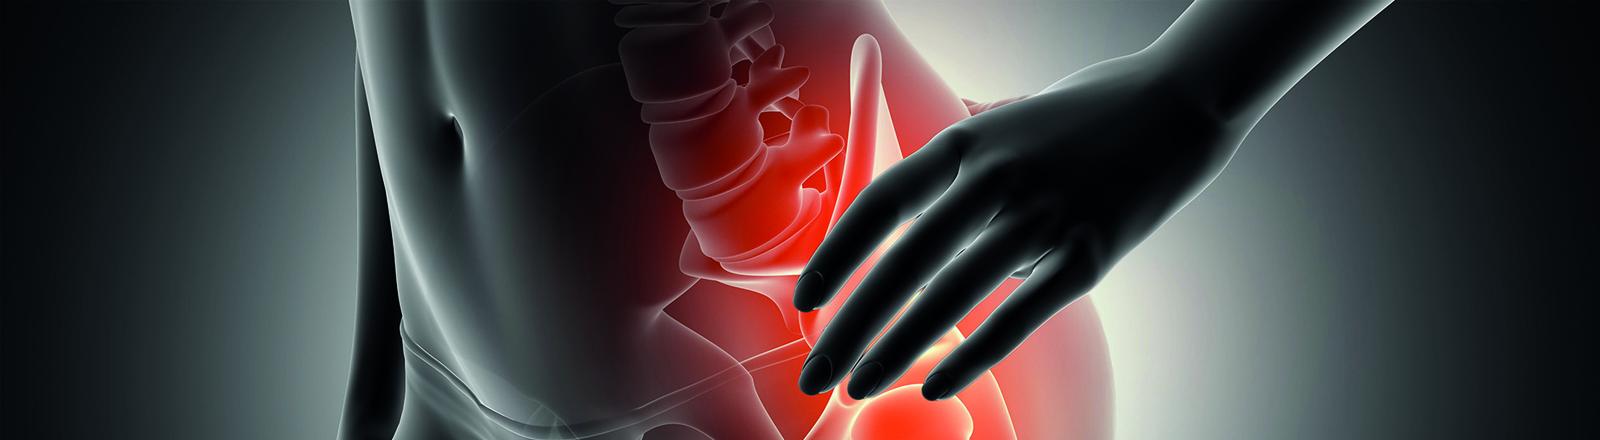 Ondas de choque en tratamiento de trocanteritis crónica